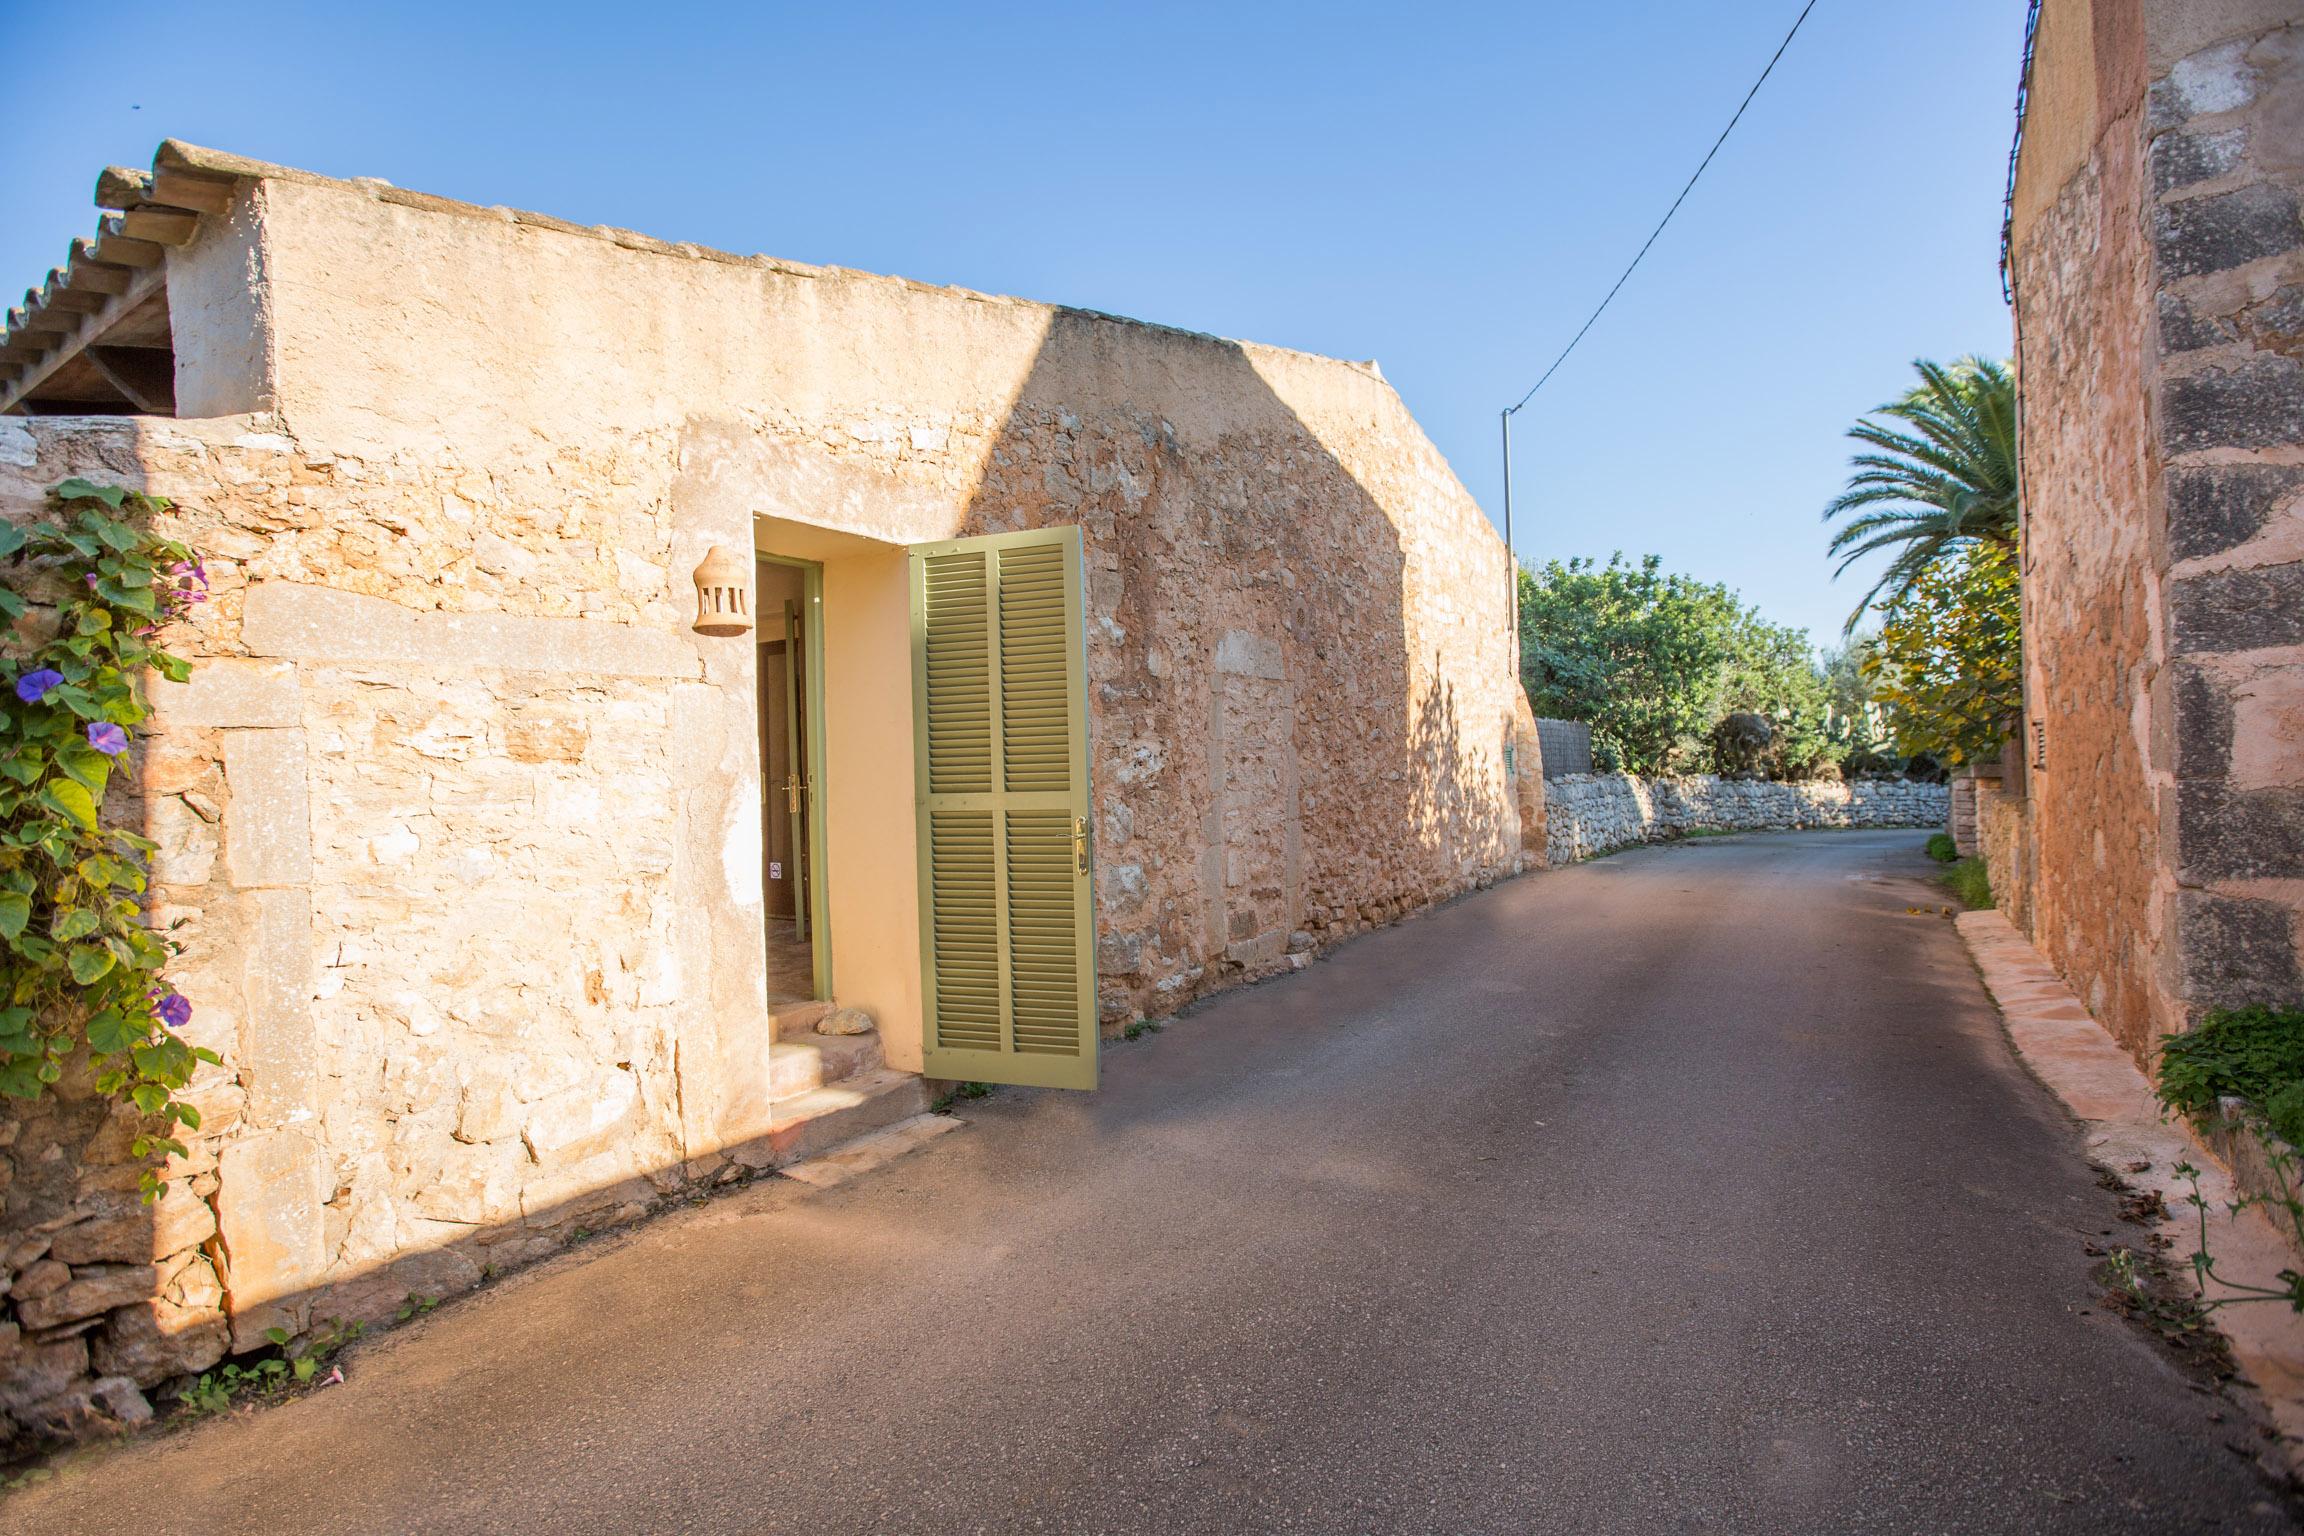 Ferienhaus GORET VELL (1856980), Santanyi, Mallorca, Balearische Inseln, Spanien, Bild 20